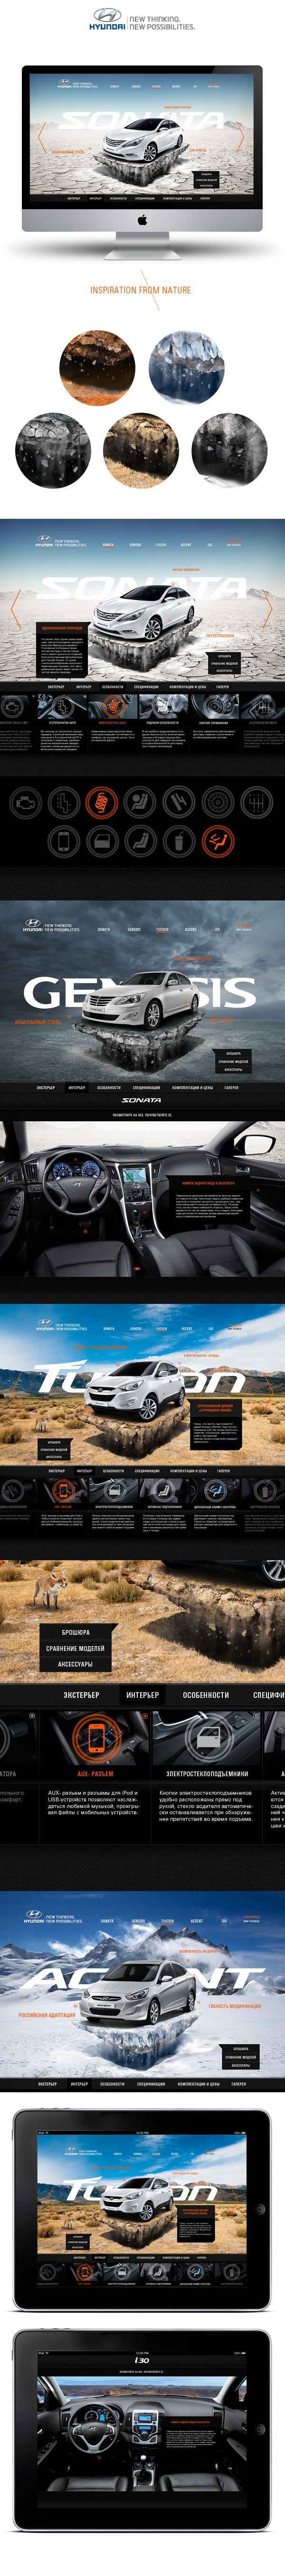 Hyundai by Ilya Kulikov, via Behance